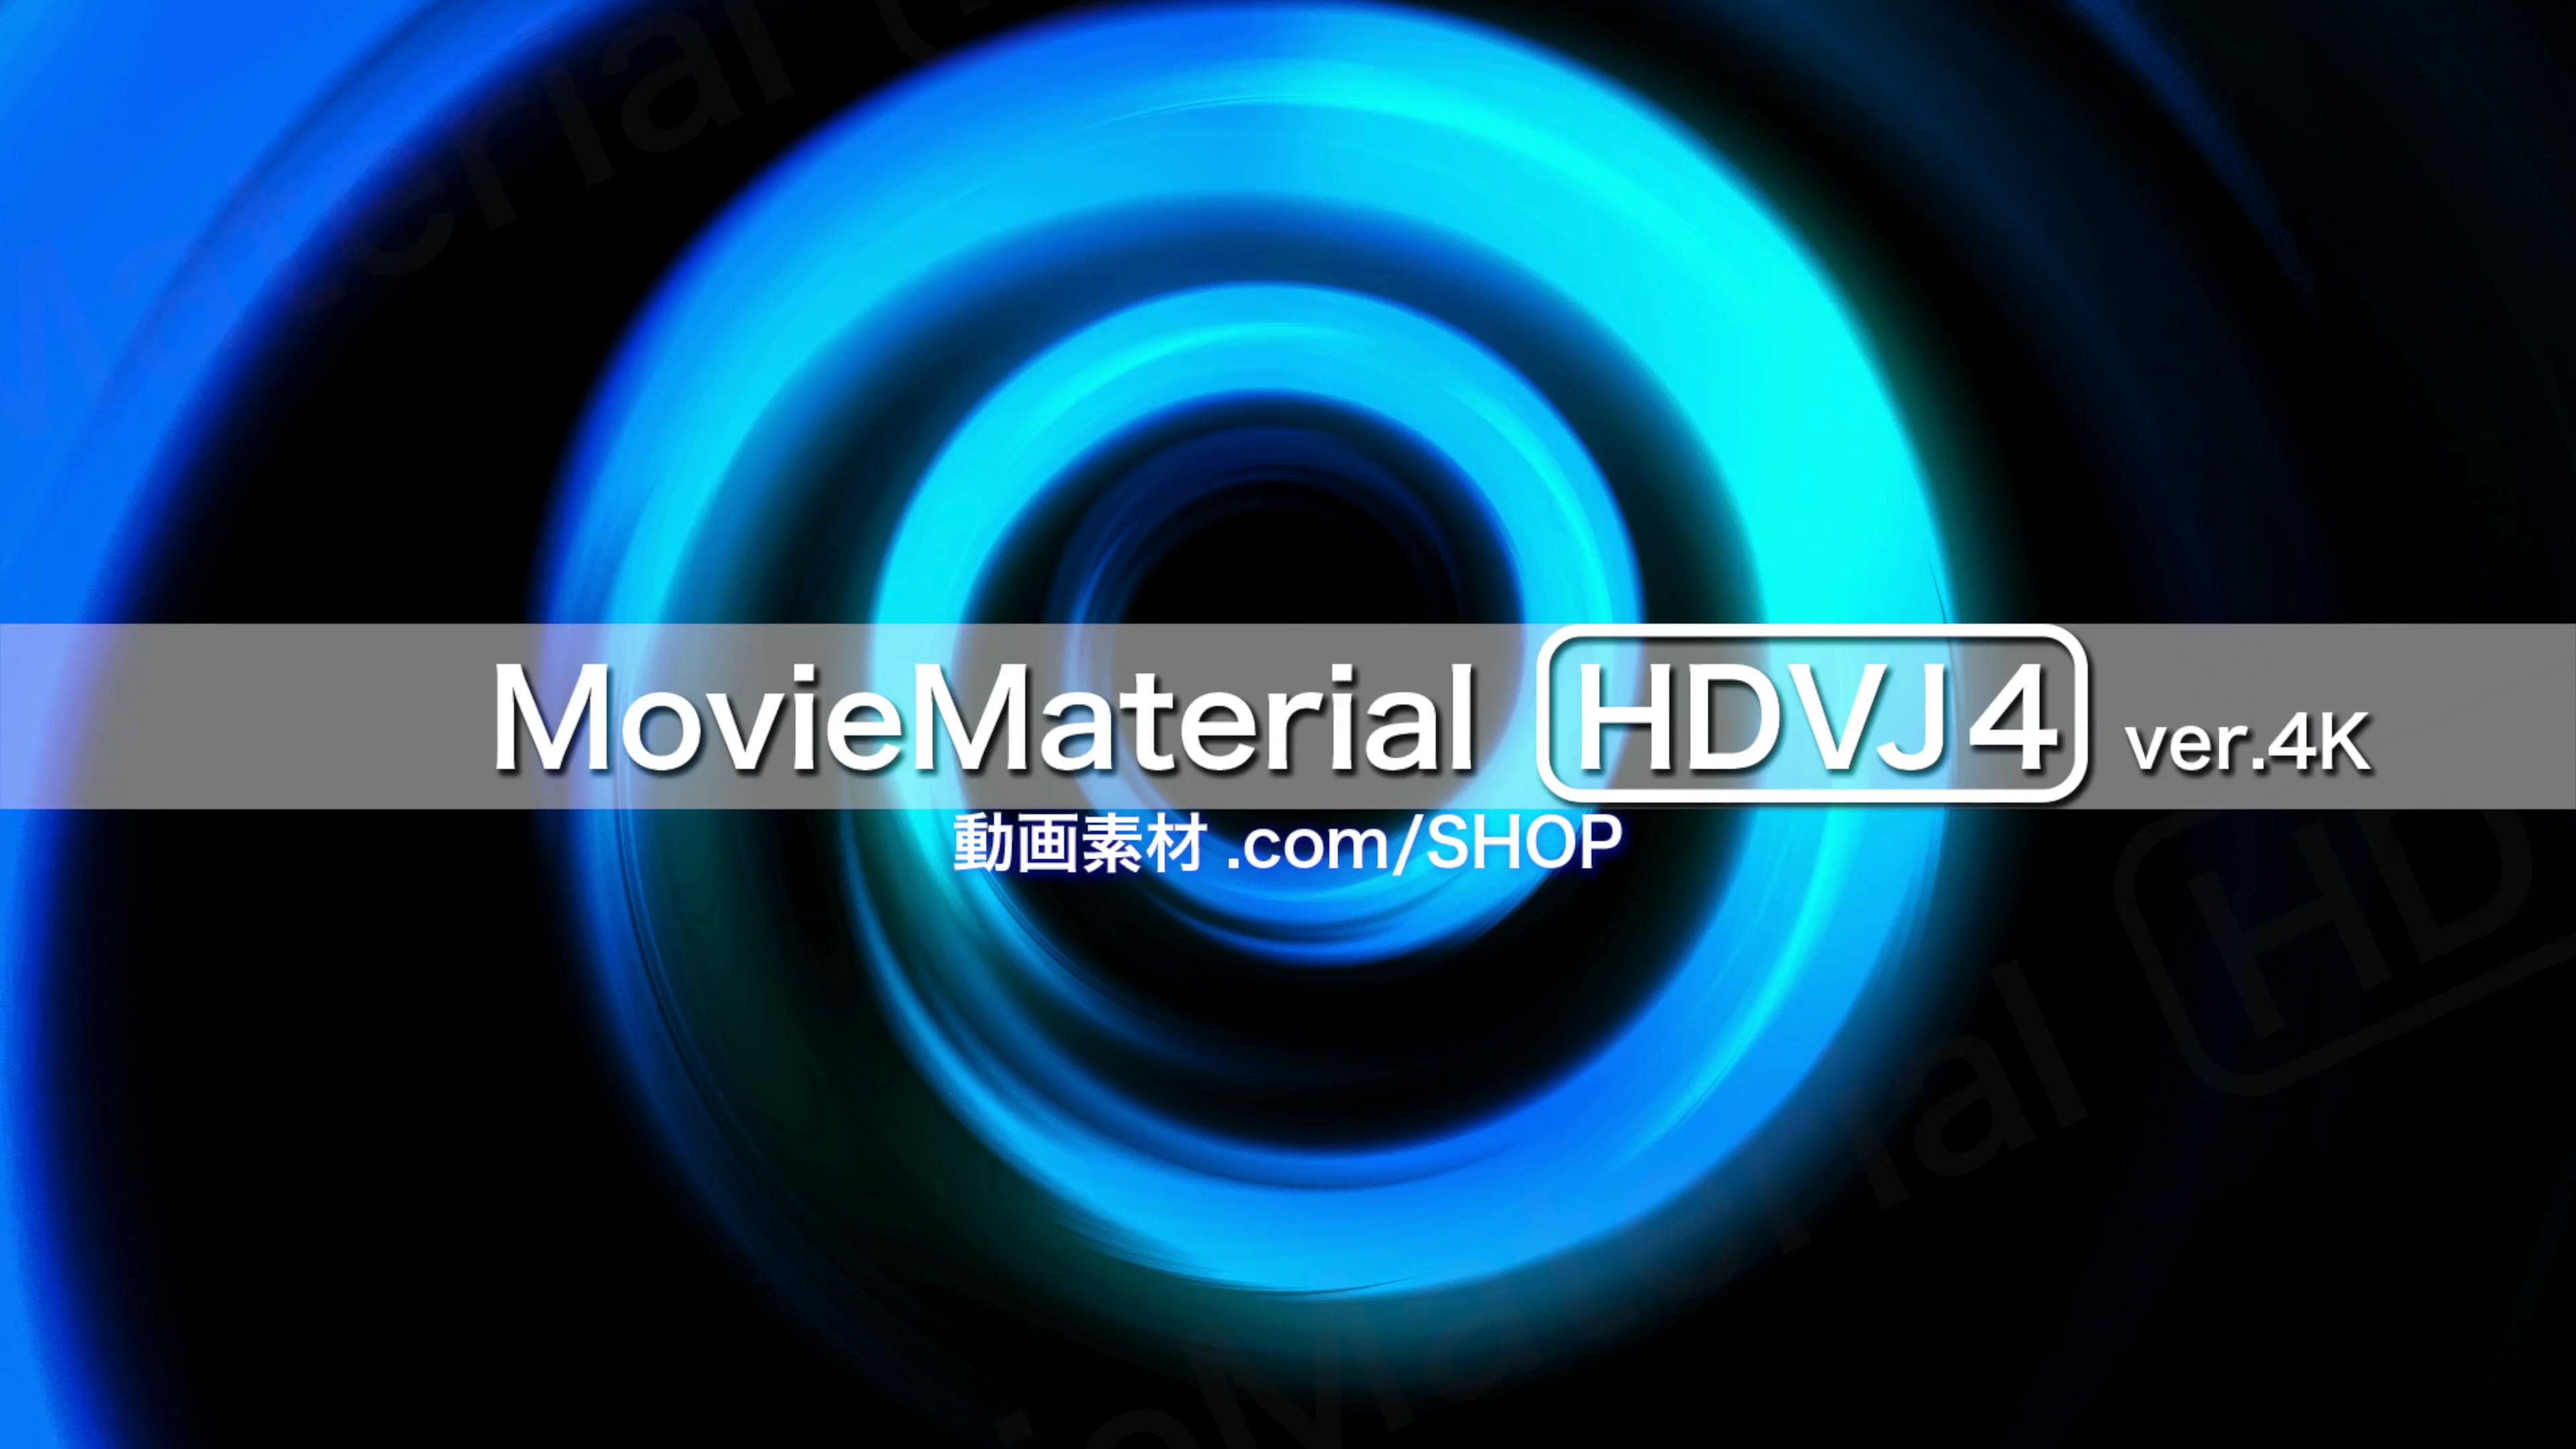 4K2Kループ動画素材集第4段【MovieMaterial HDVJ4 ver.4K】ロイヤリティフリー(著作権使用料無料)1